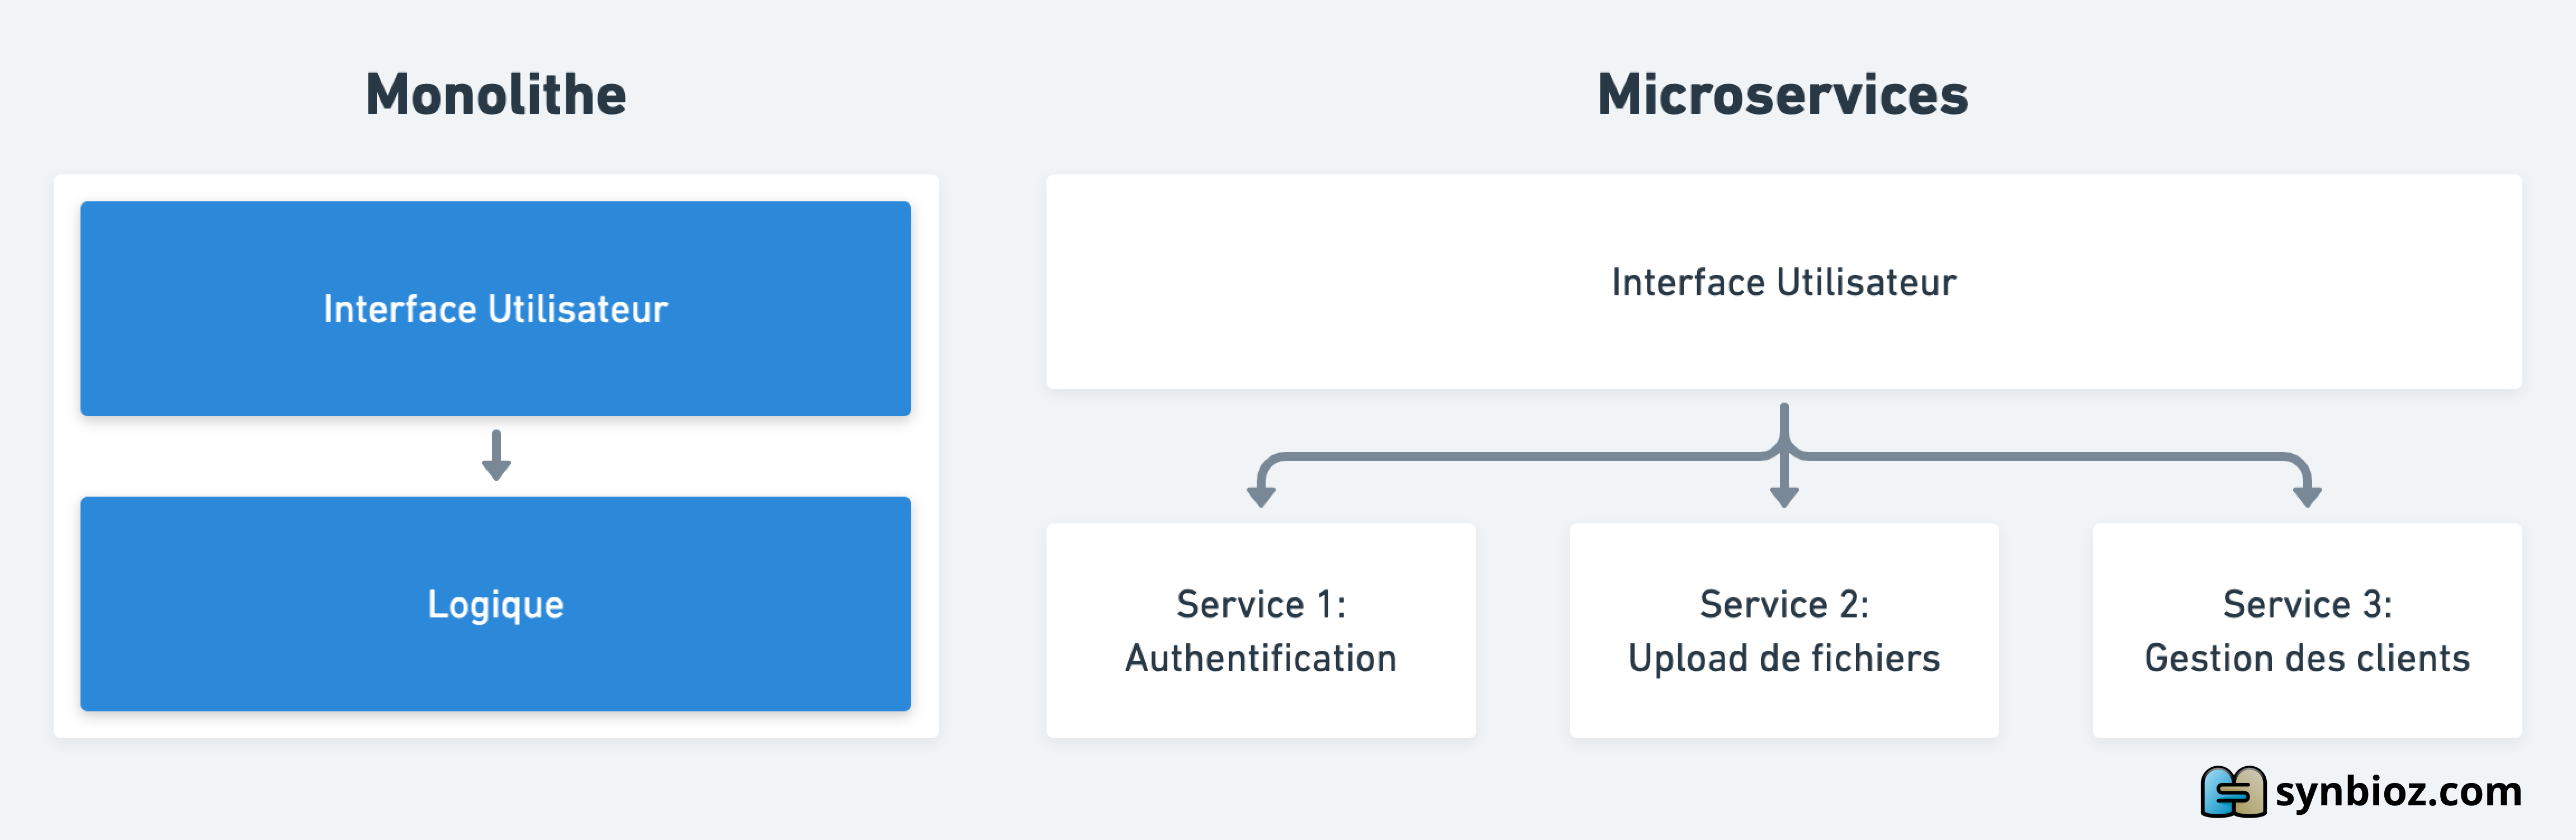 Monolithe versus Microservices